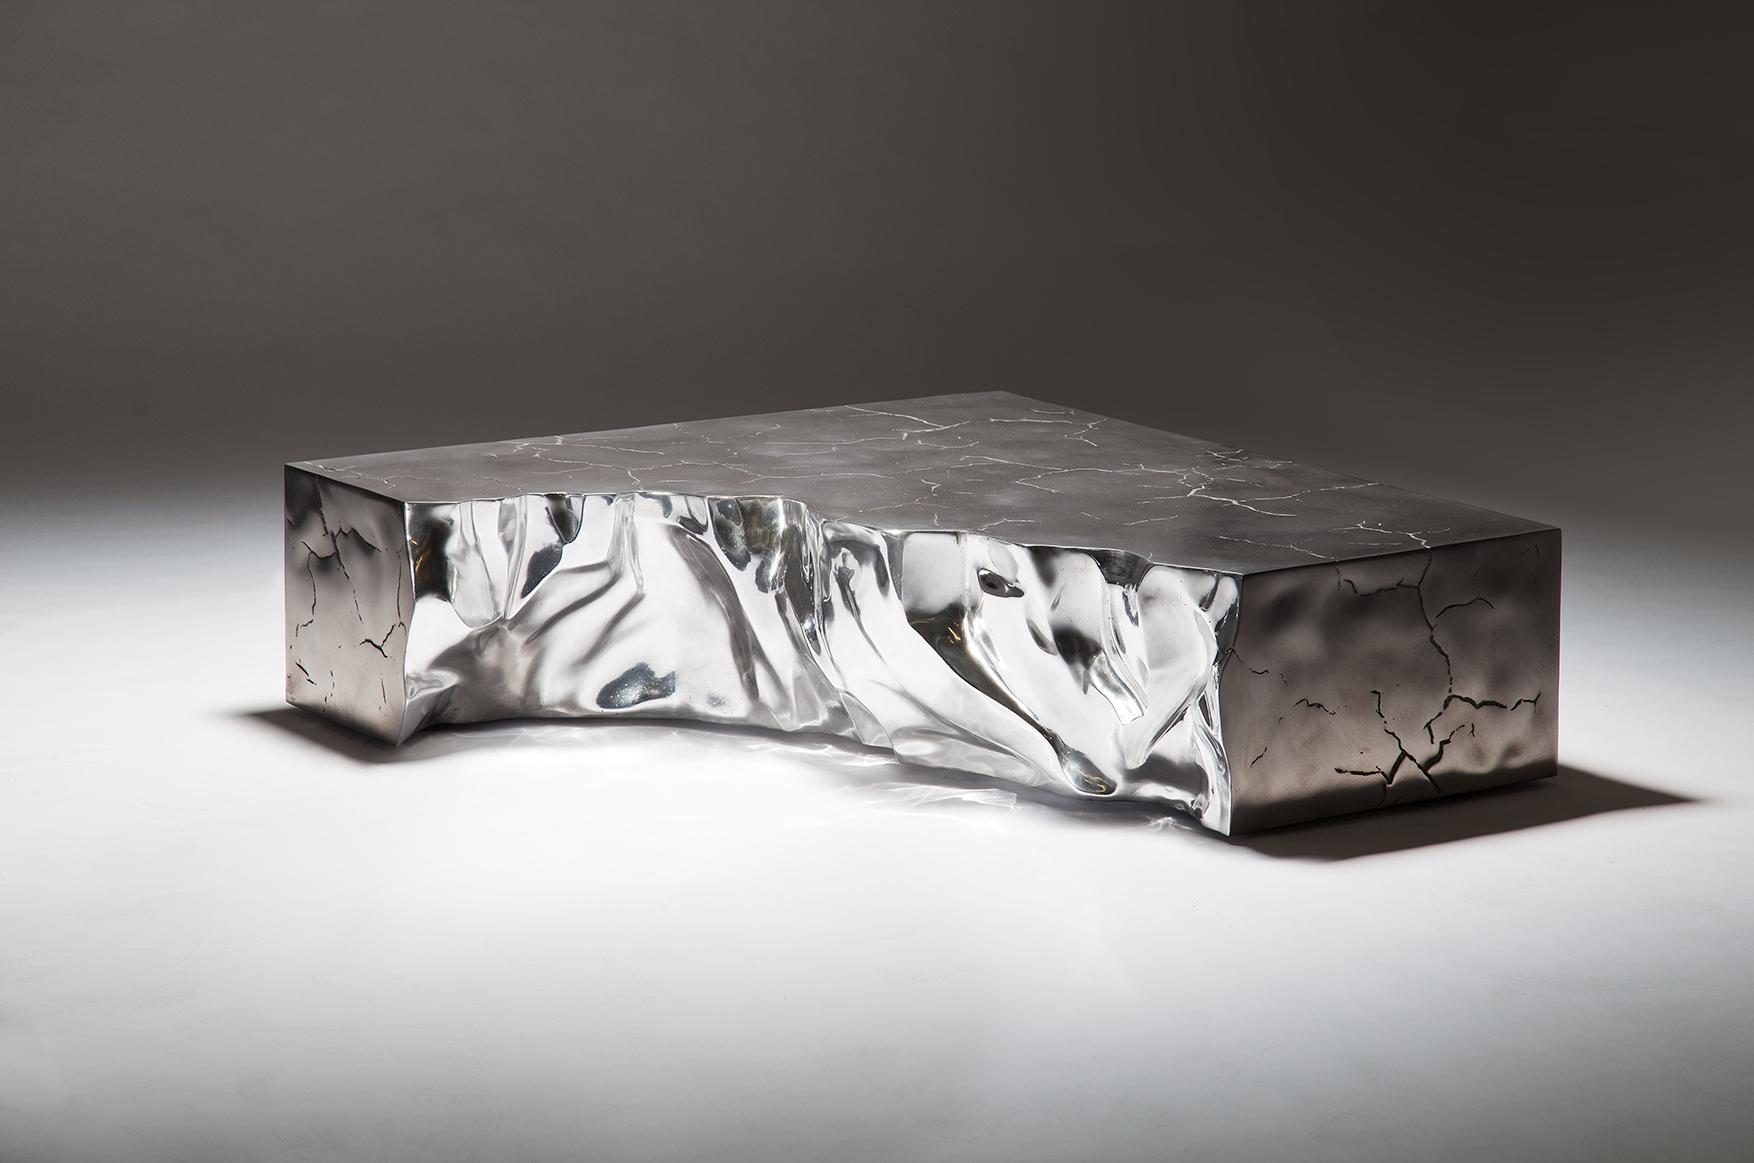 bu_00983_fragmented crack_aluminium_coffee table_b.jpg